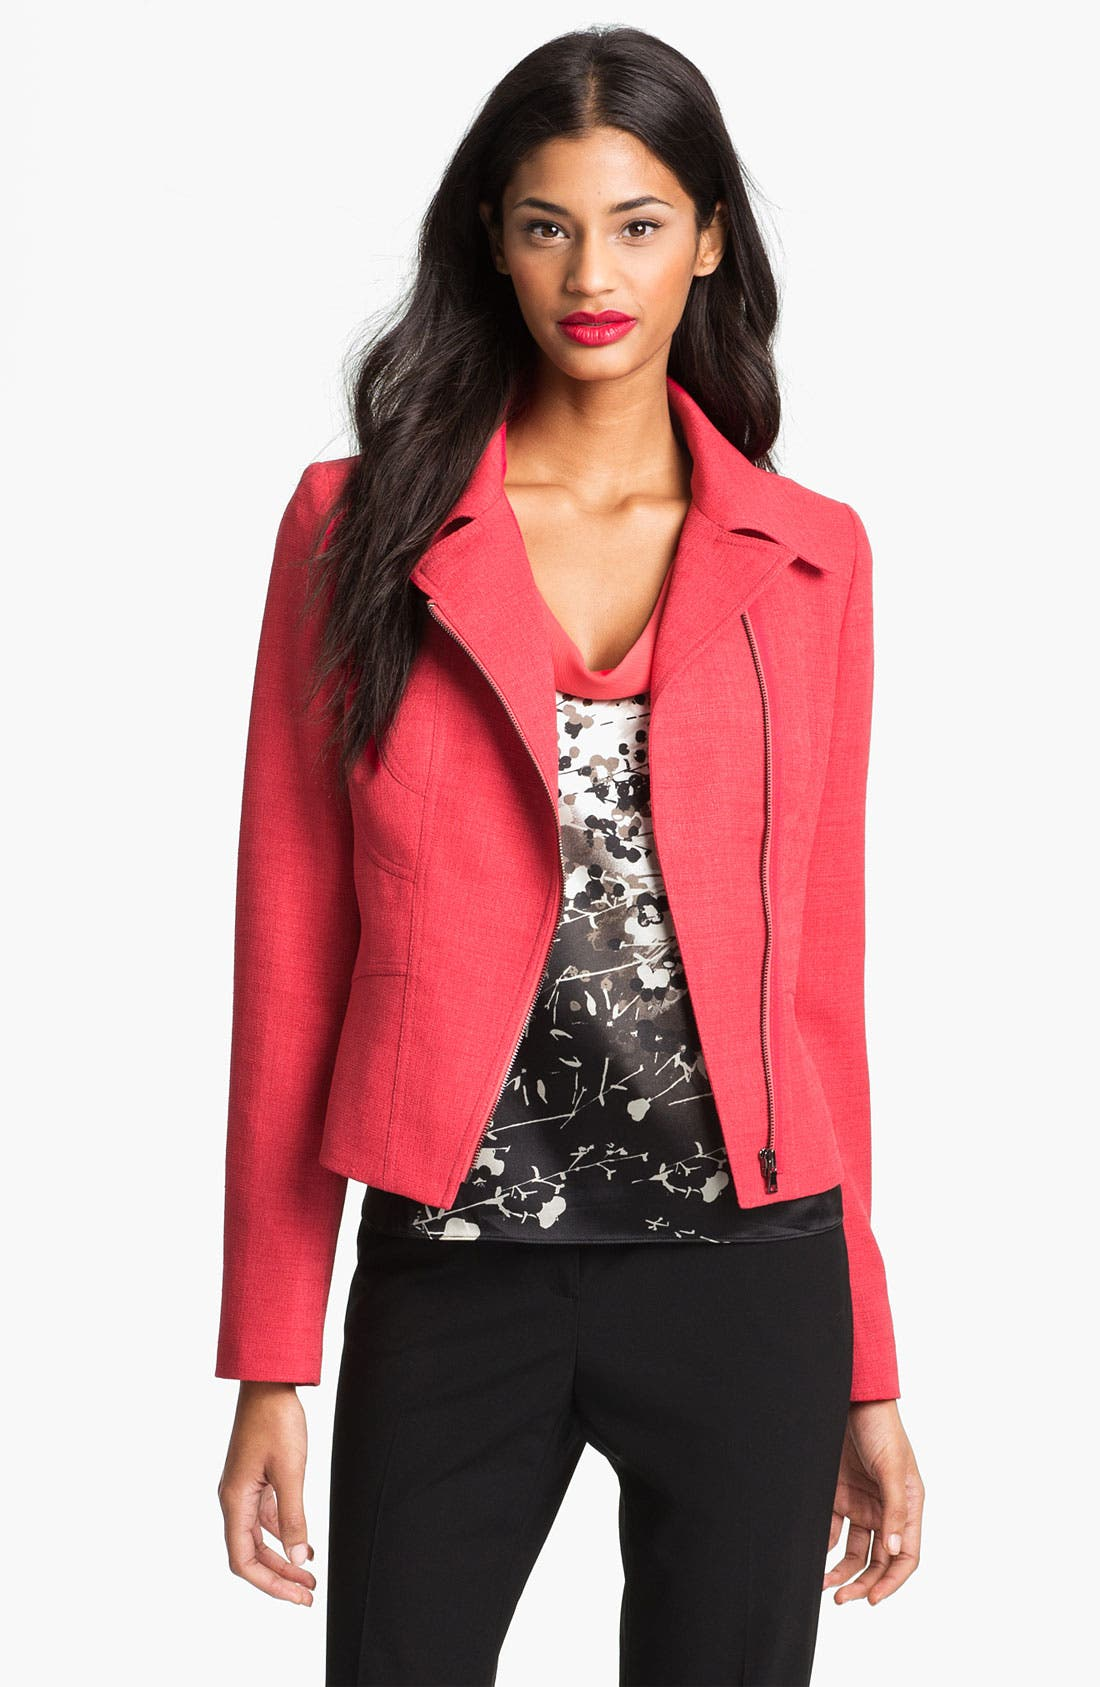 Alternate Image 1 Selected - T Tahari 'Vidala' Jacket (Petite)